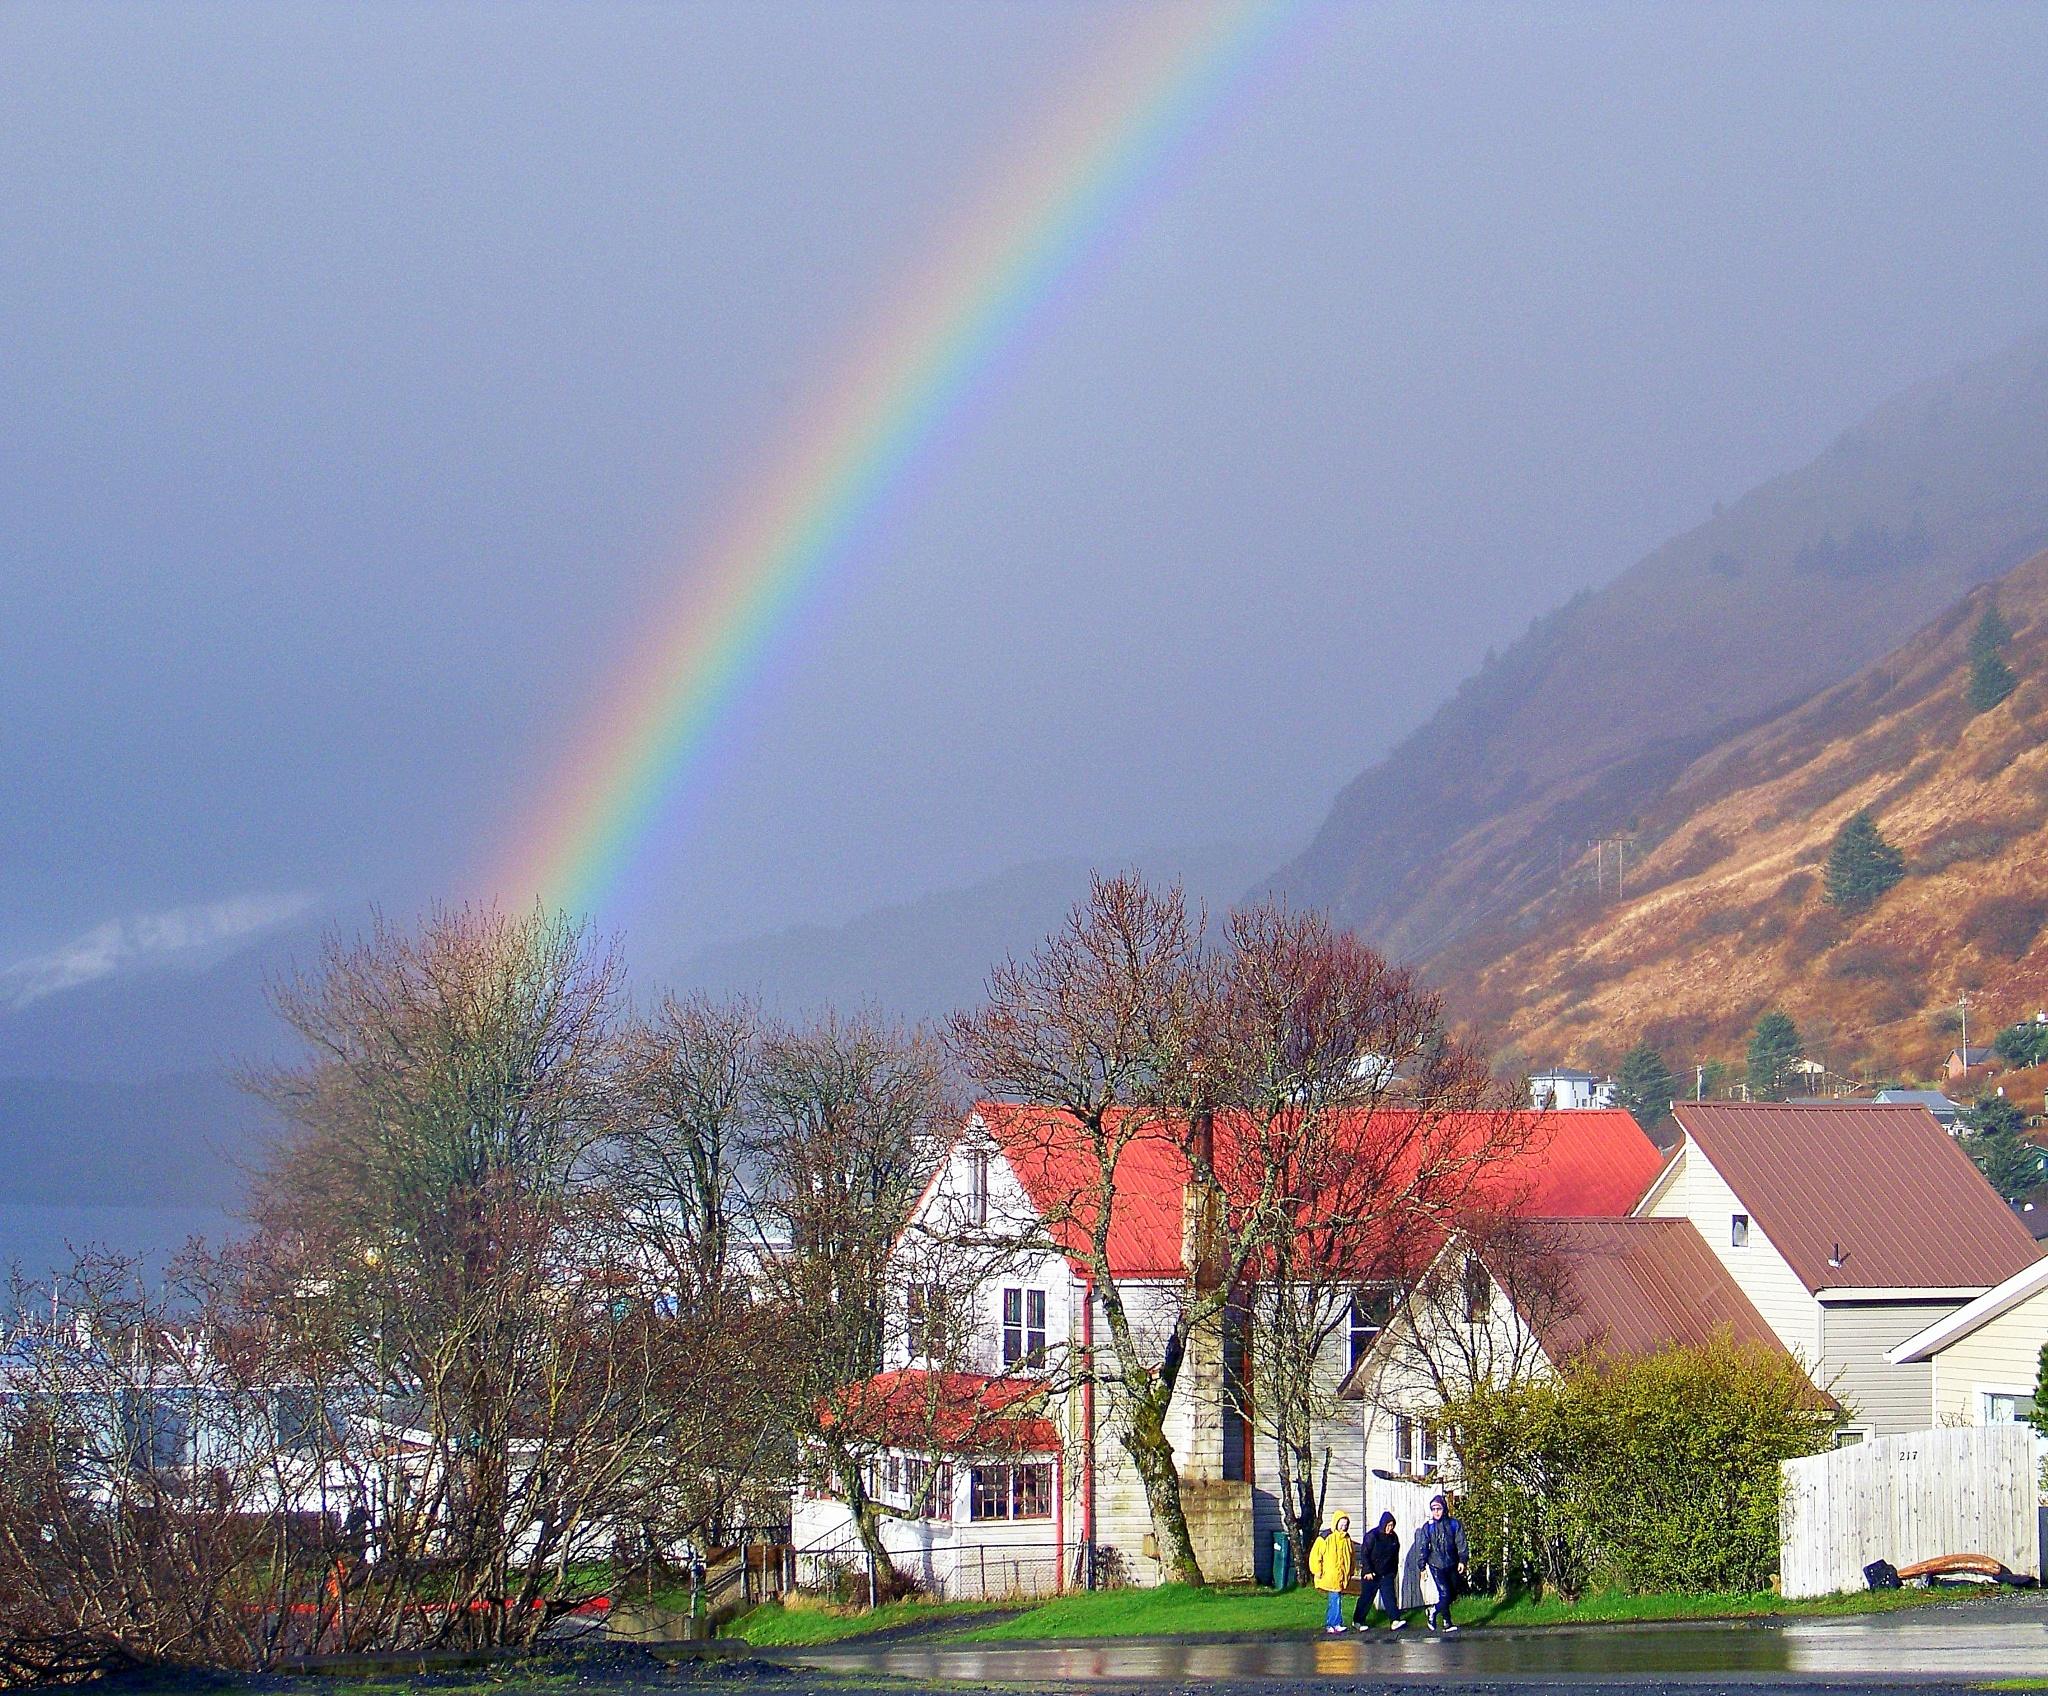 Rainy Day Colors by jone suleski